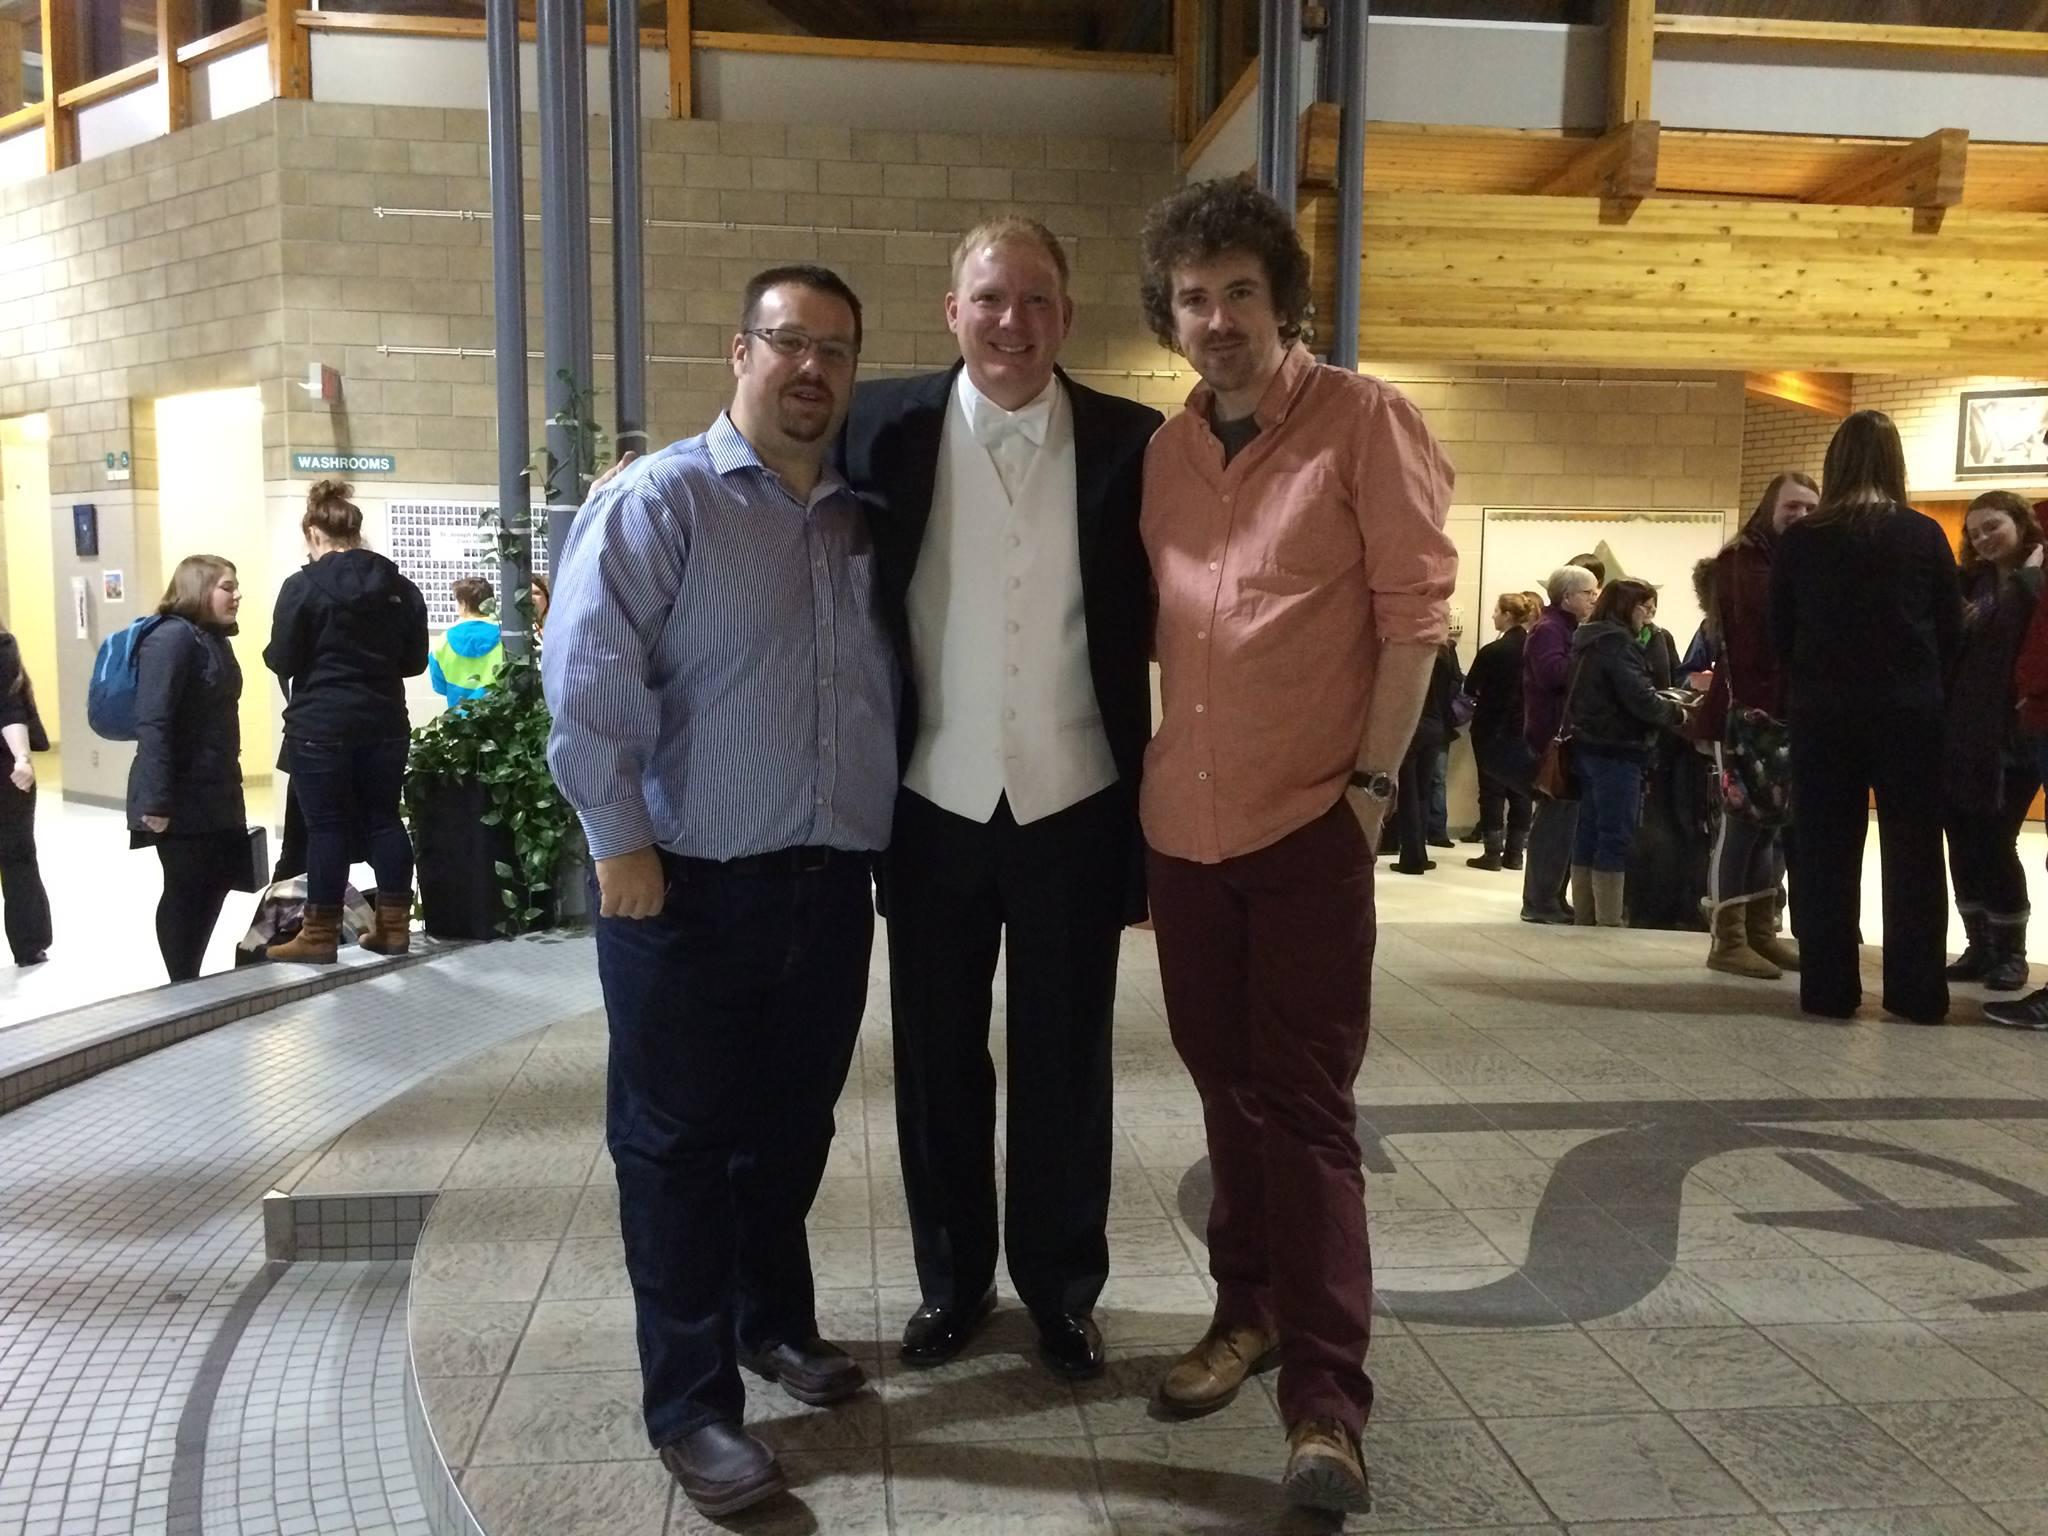 Tom Davoren, British composer Peter Meechan and Dr Darrin Oehlerking, conductor at the University of Saskatchewan